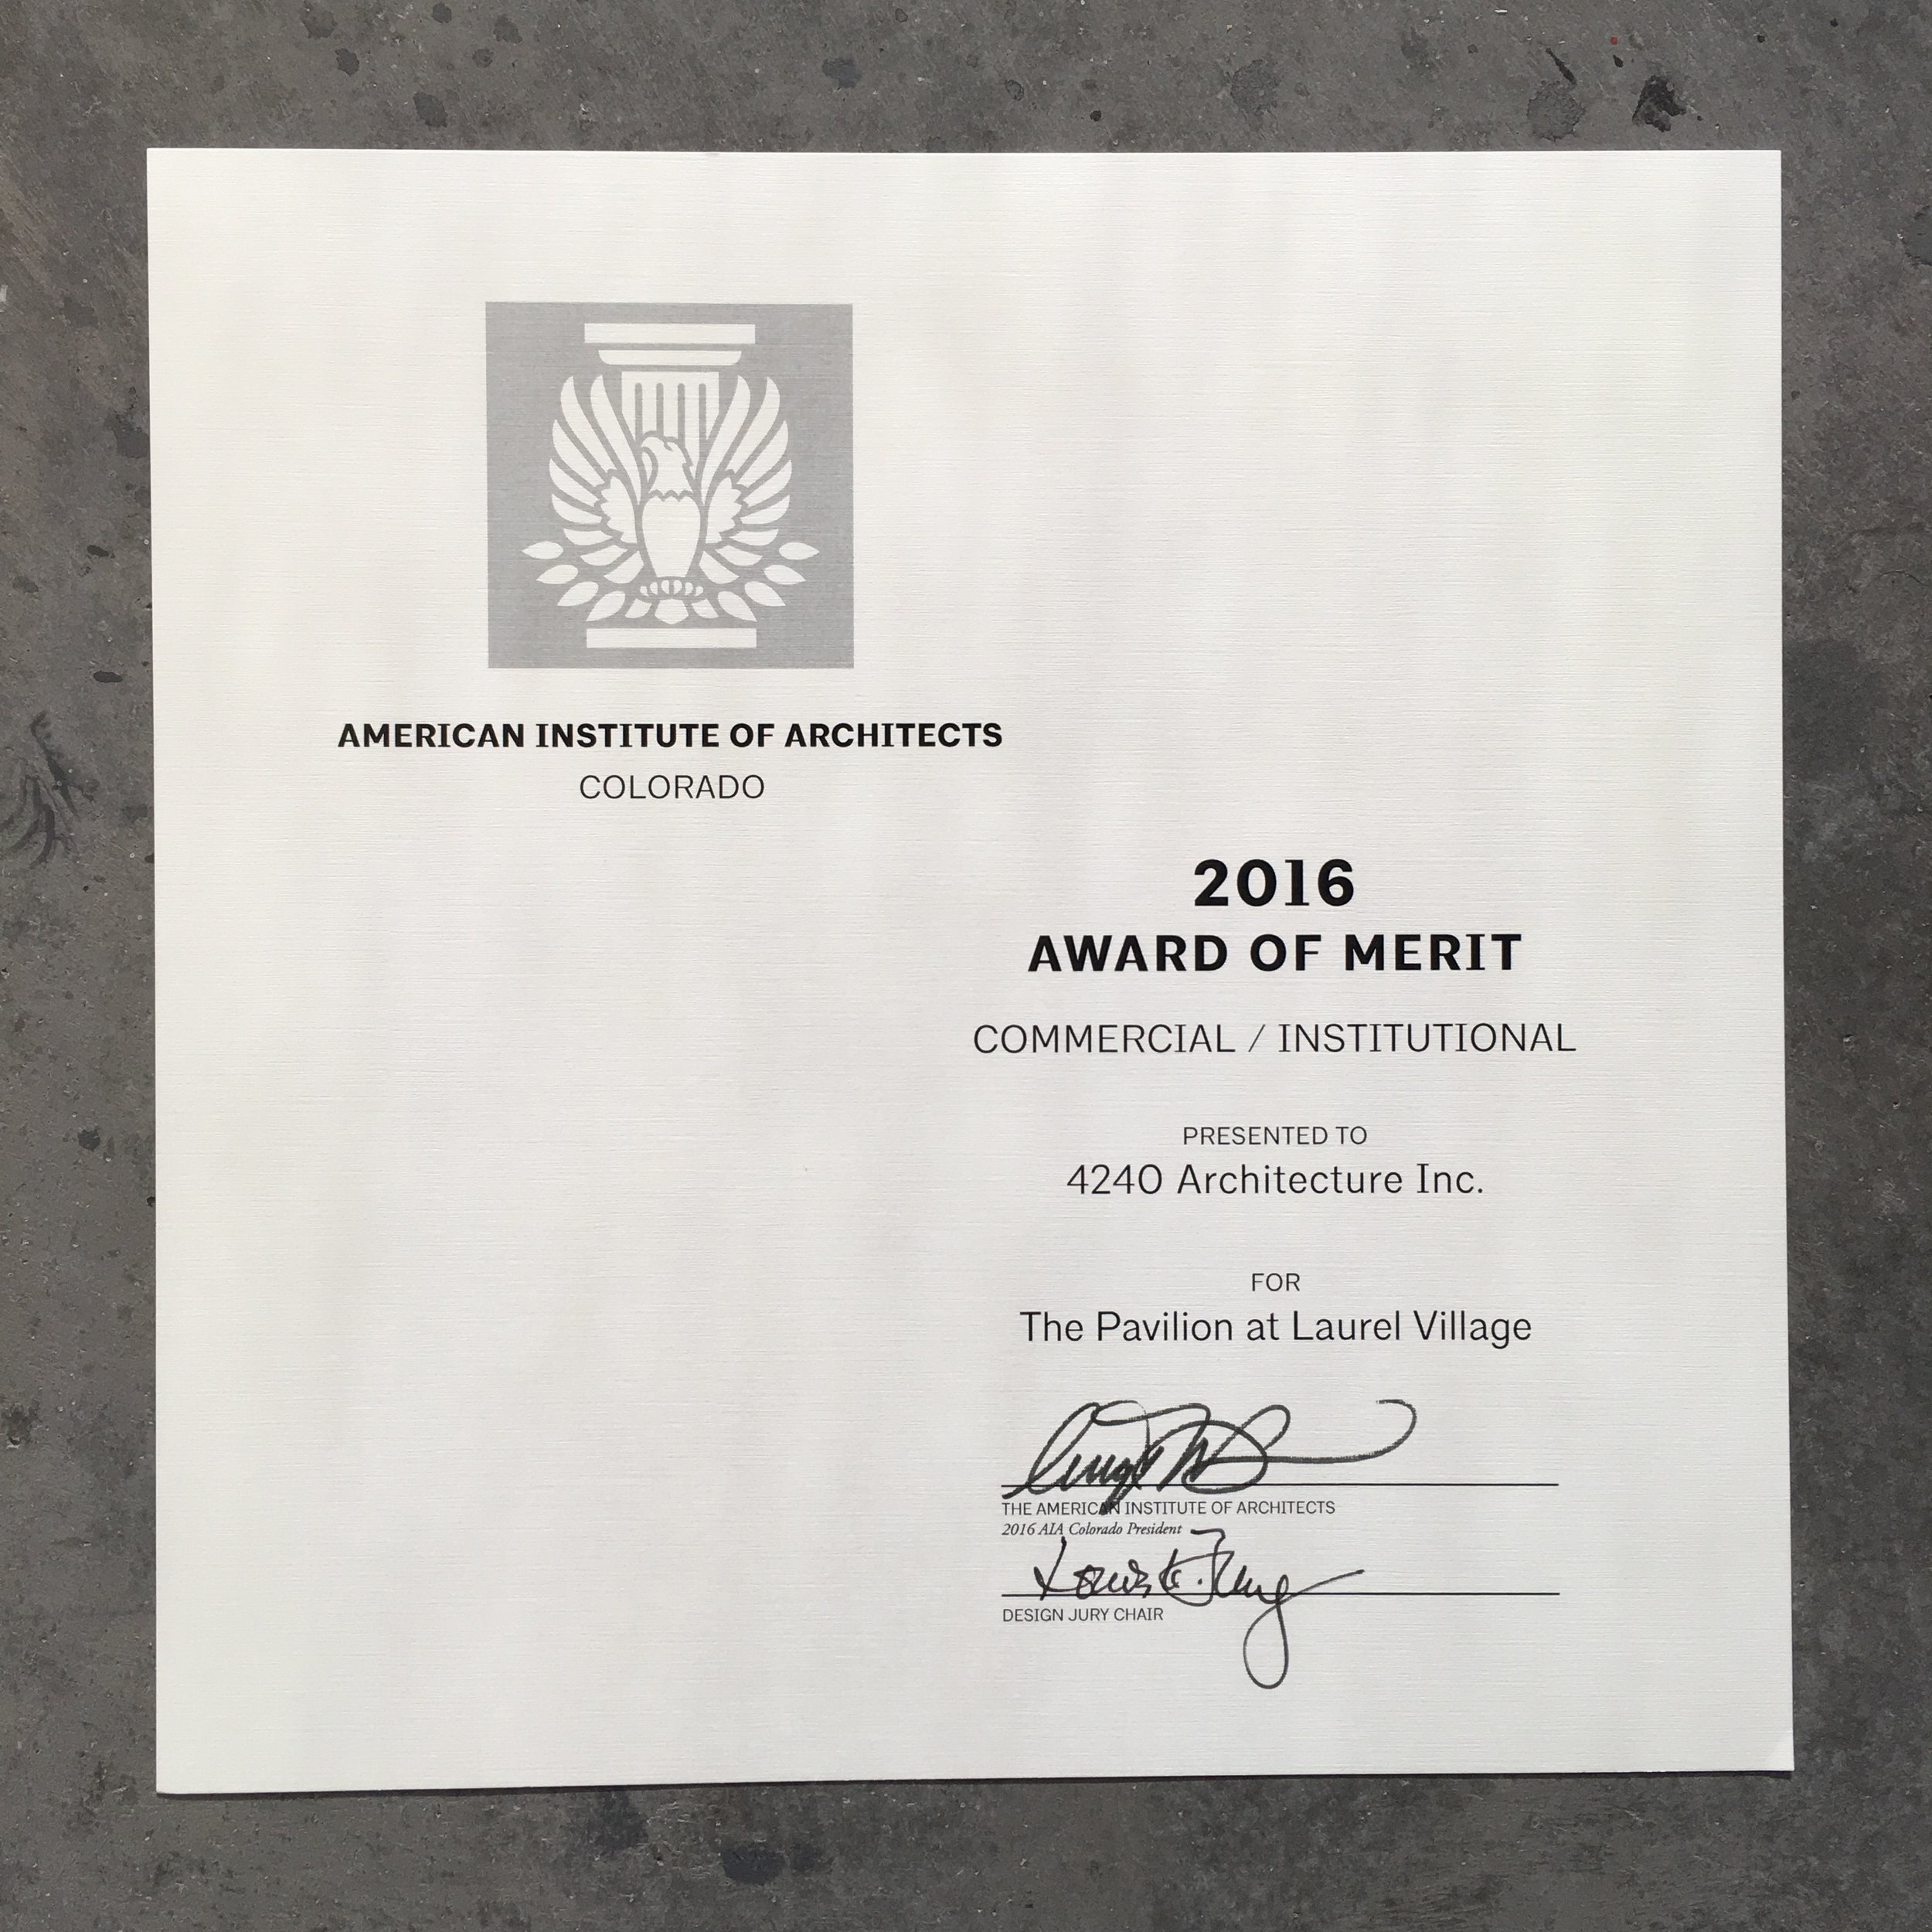 4240 Now Architecture 7 Days Slim Platinum Original 100 Aia Colorado Honors The Pavilion At P Dc 2016